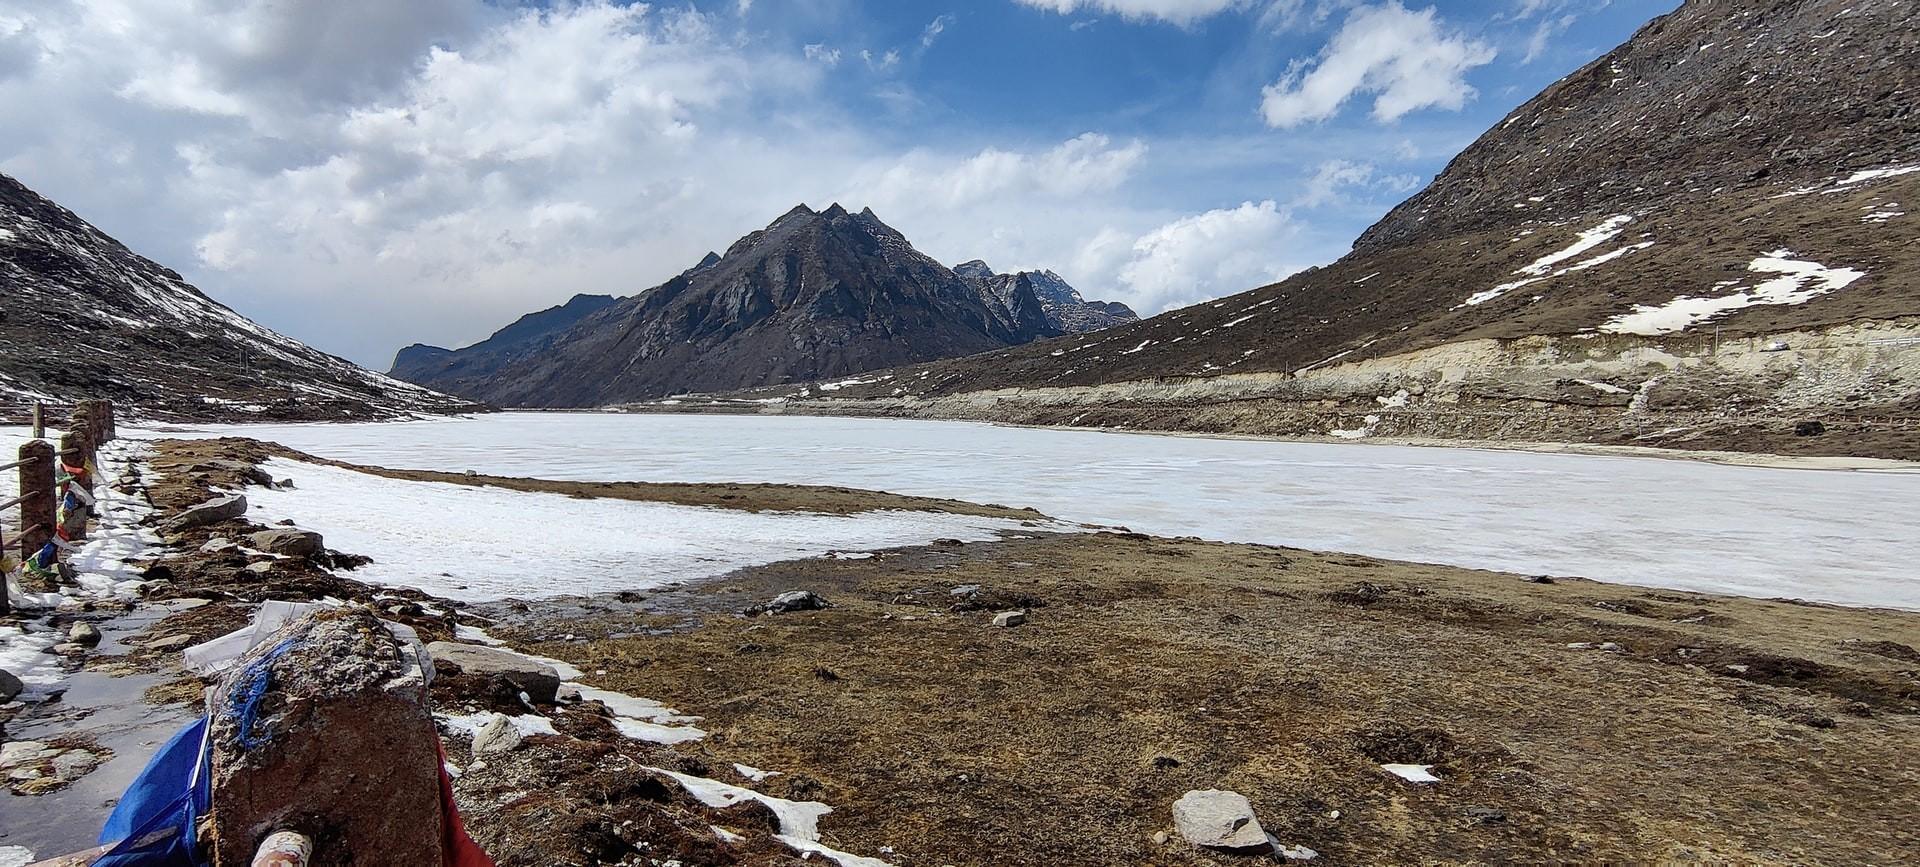 Tawang Arunachal Pradesh